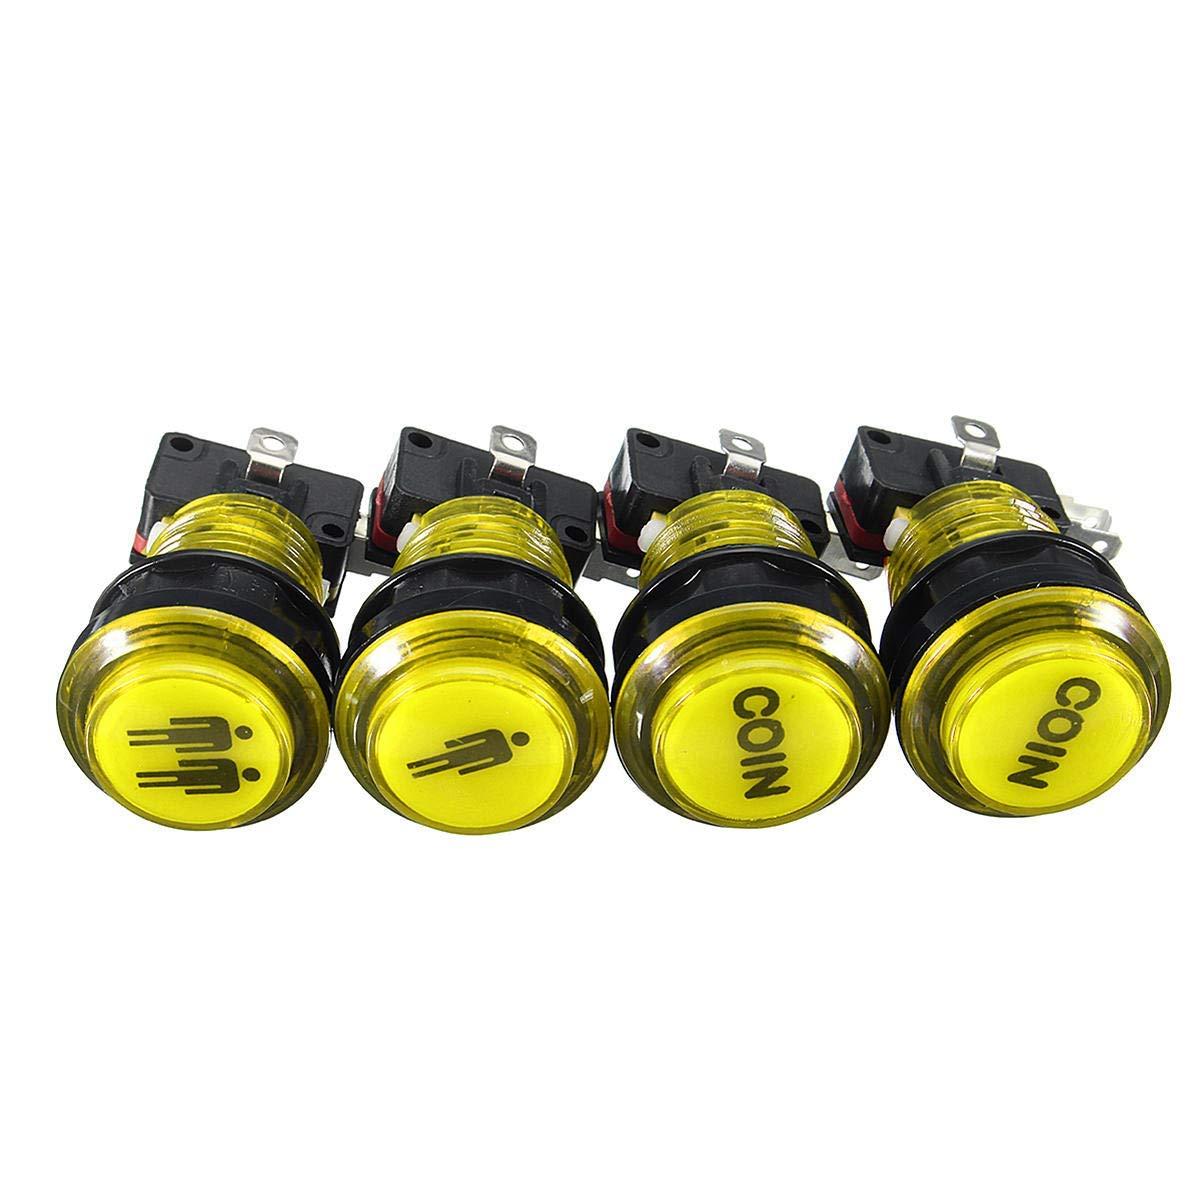 LED Arcade Single Dual Start Player Coin Push Button - Arcade Video Games DIY Push Button - (Yellow) - 1 x 1P LED Push Button, 1 x 2P LED Push Button, 2 x COIN LED